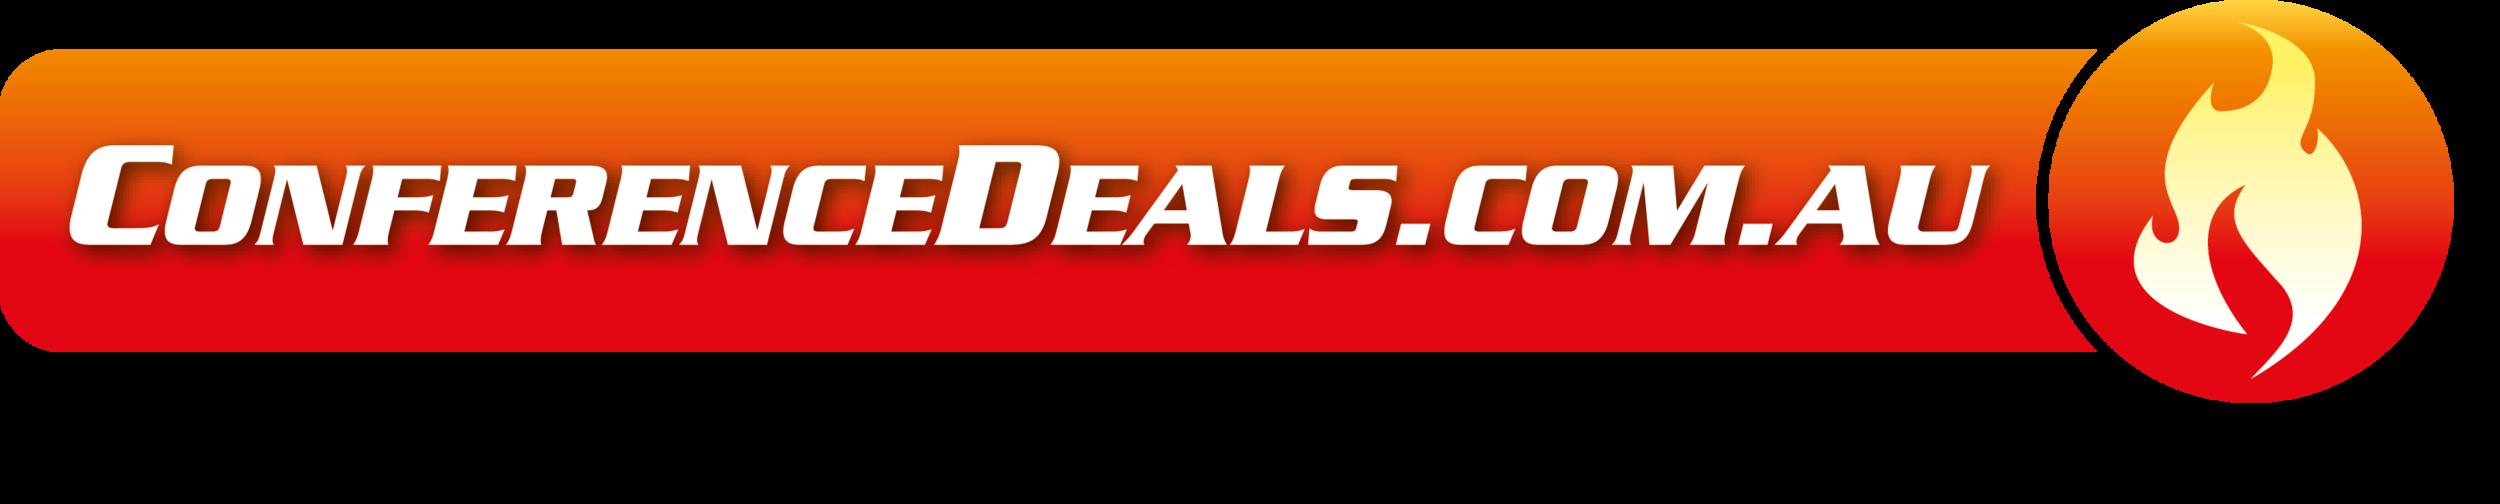 Conference Deals Logo.png